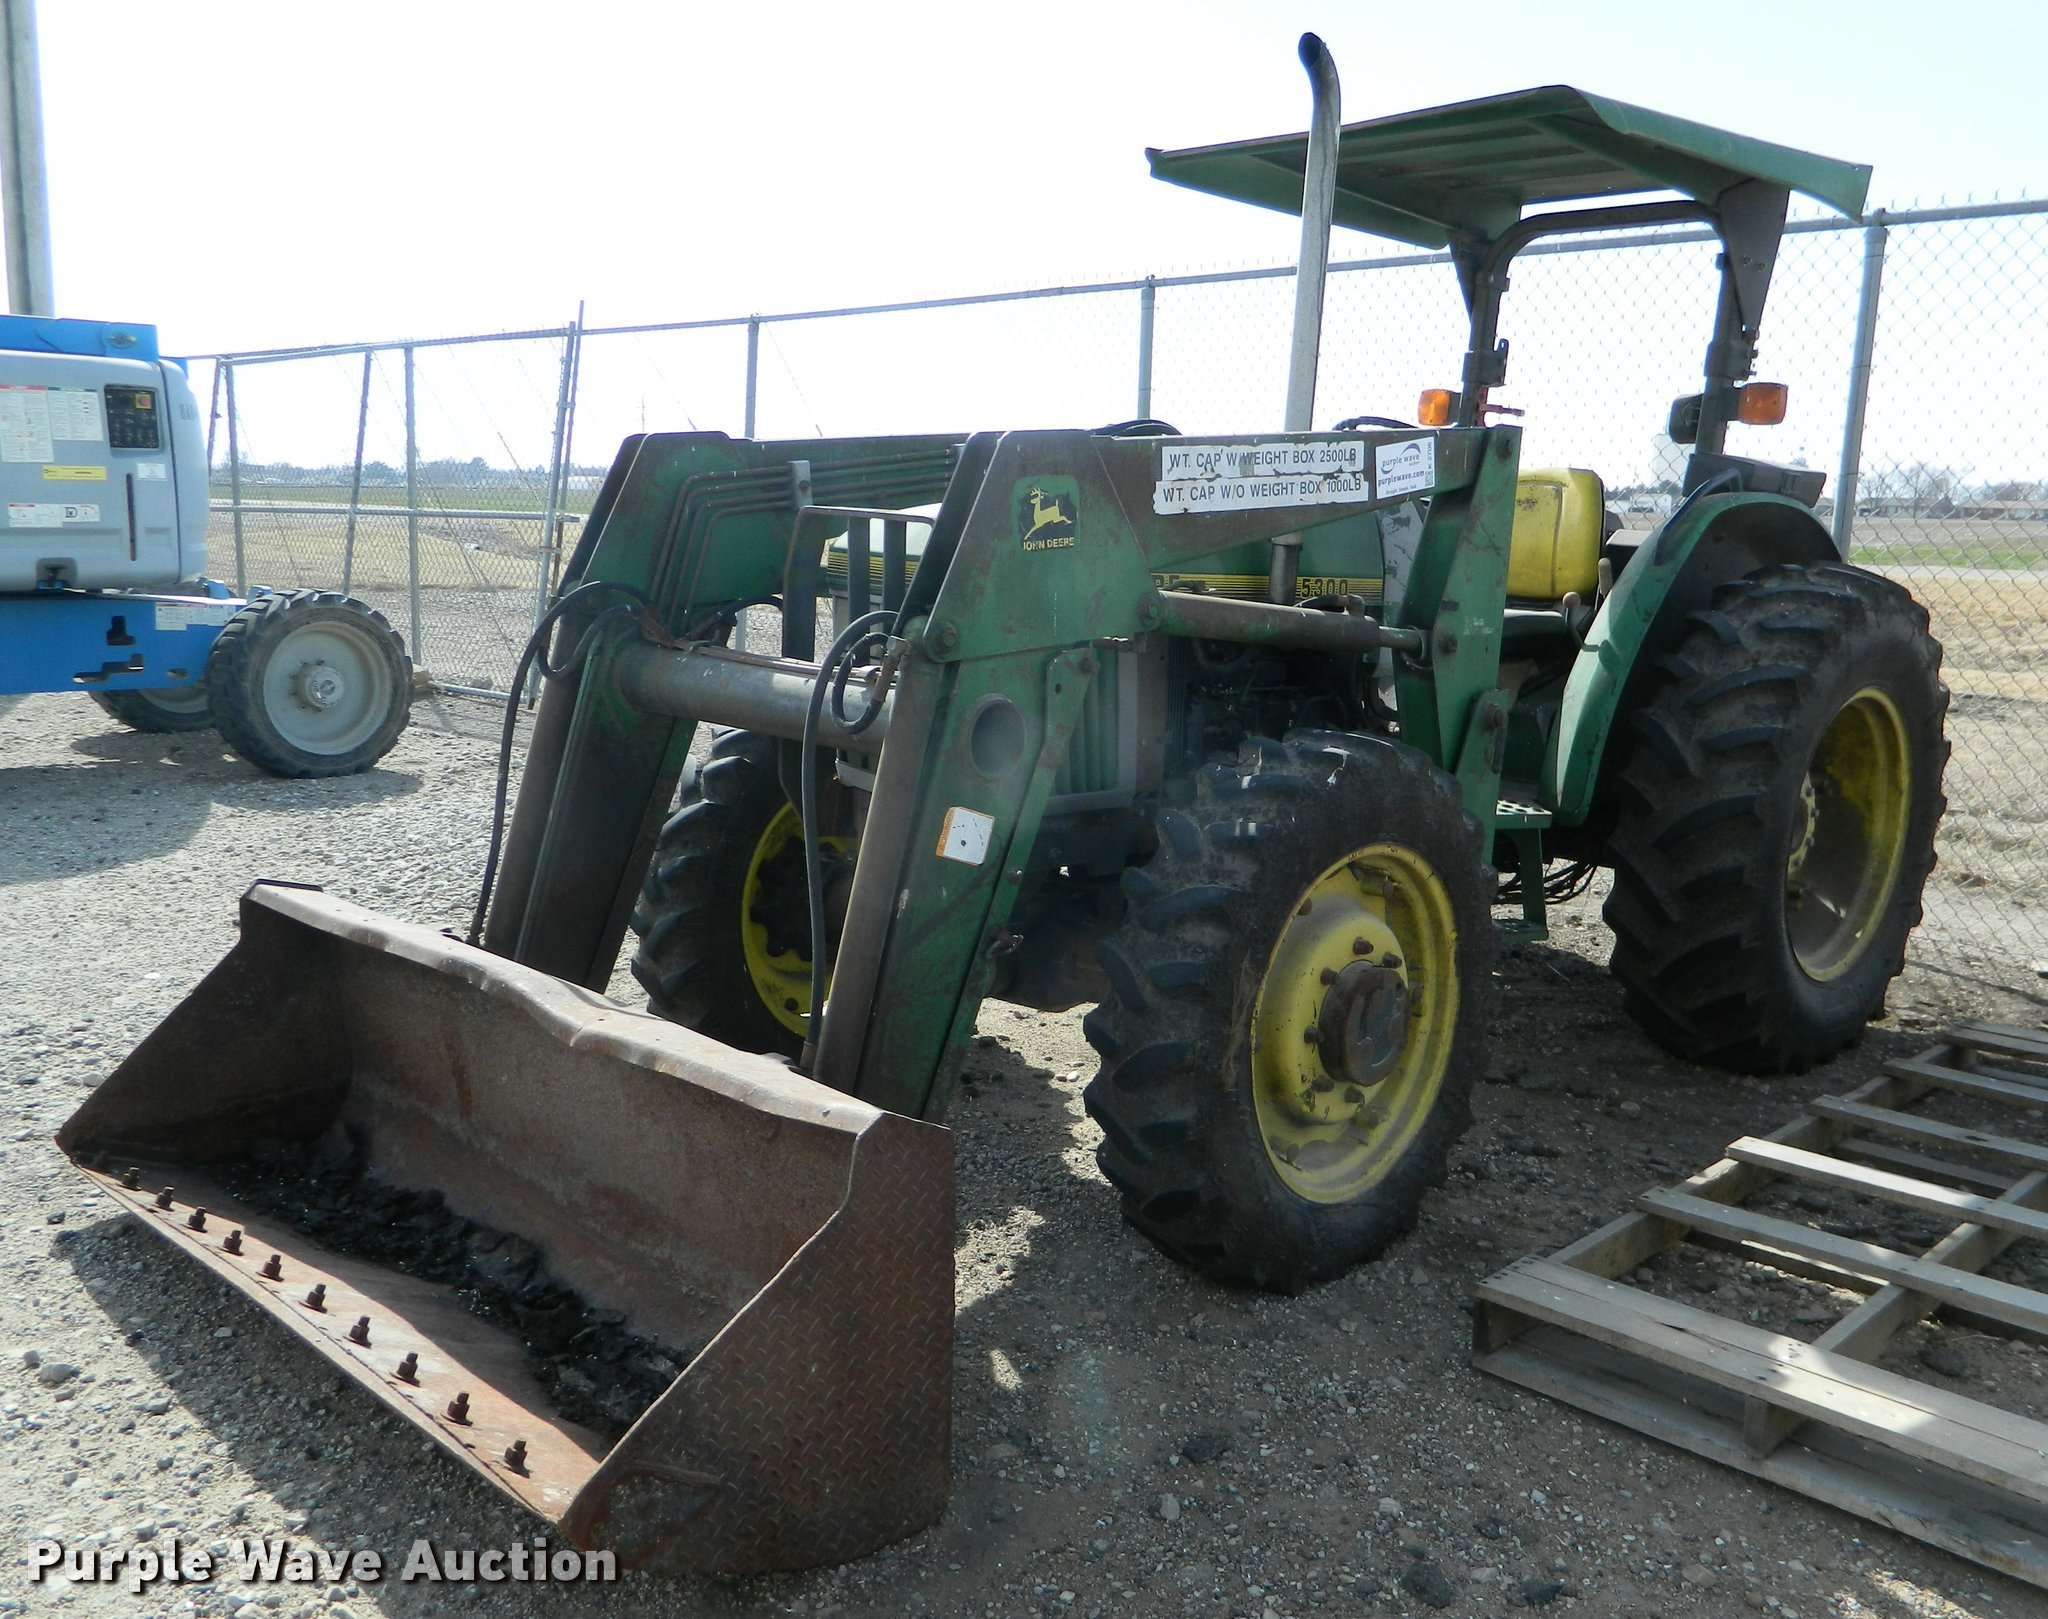 K2706 1996 john deere 5300 mfwd tractor item k2706 sold! march